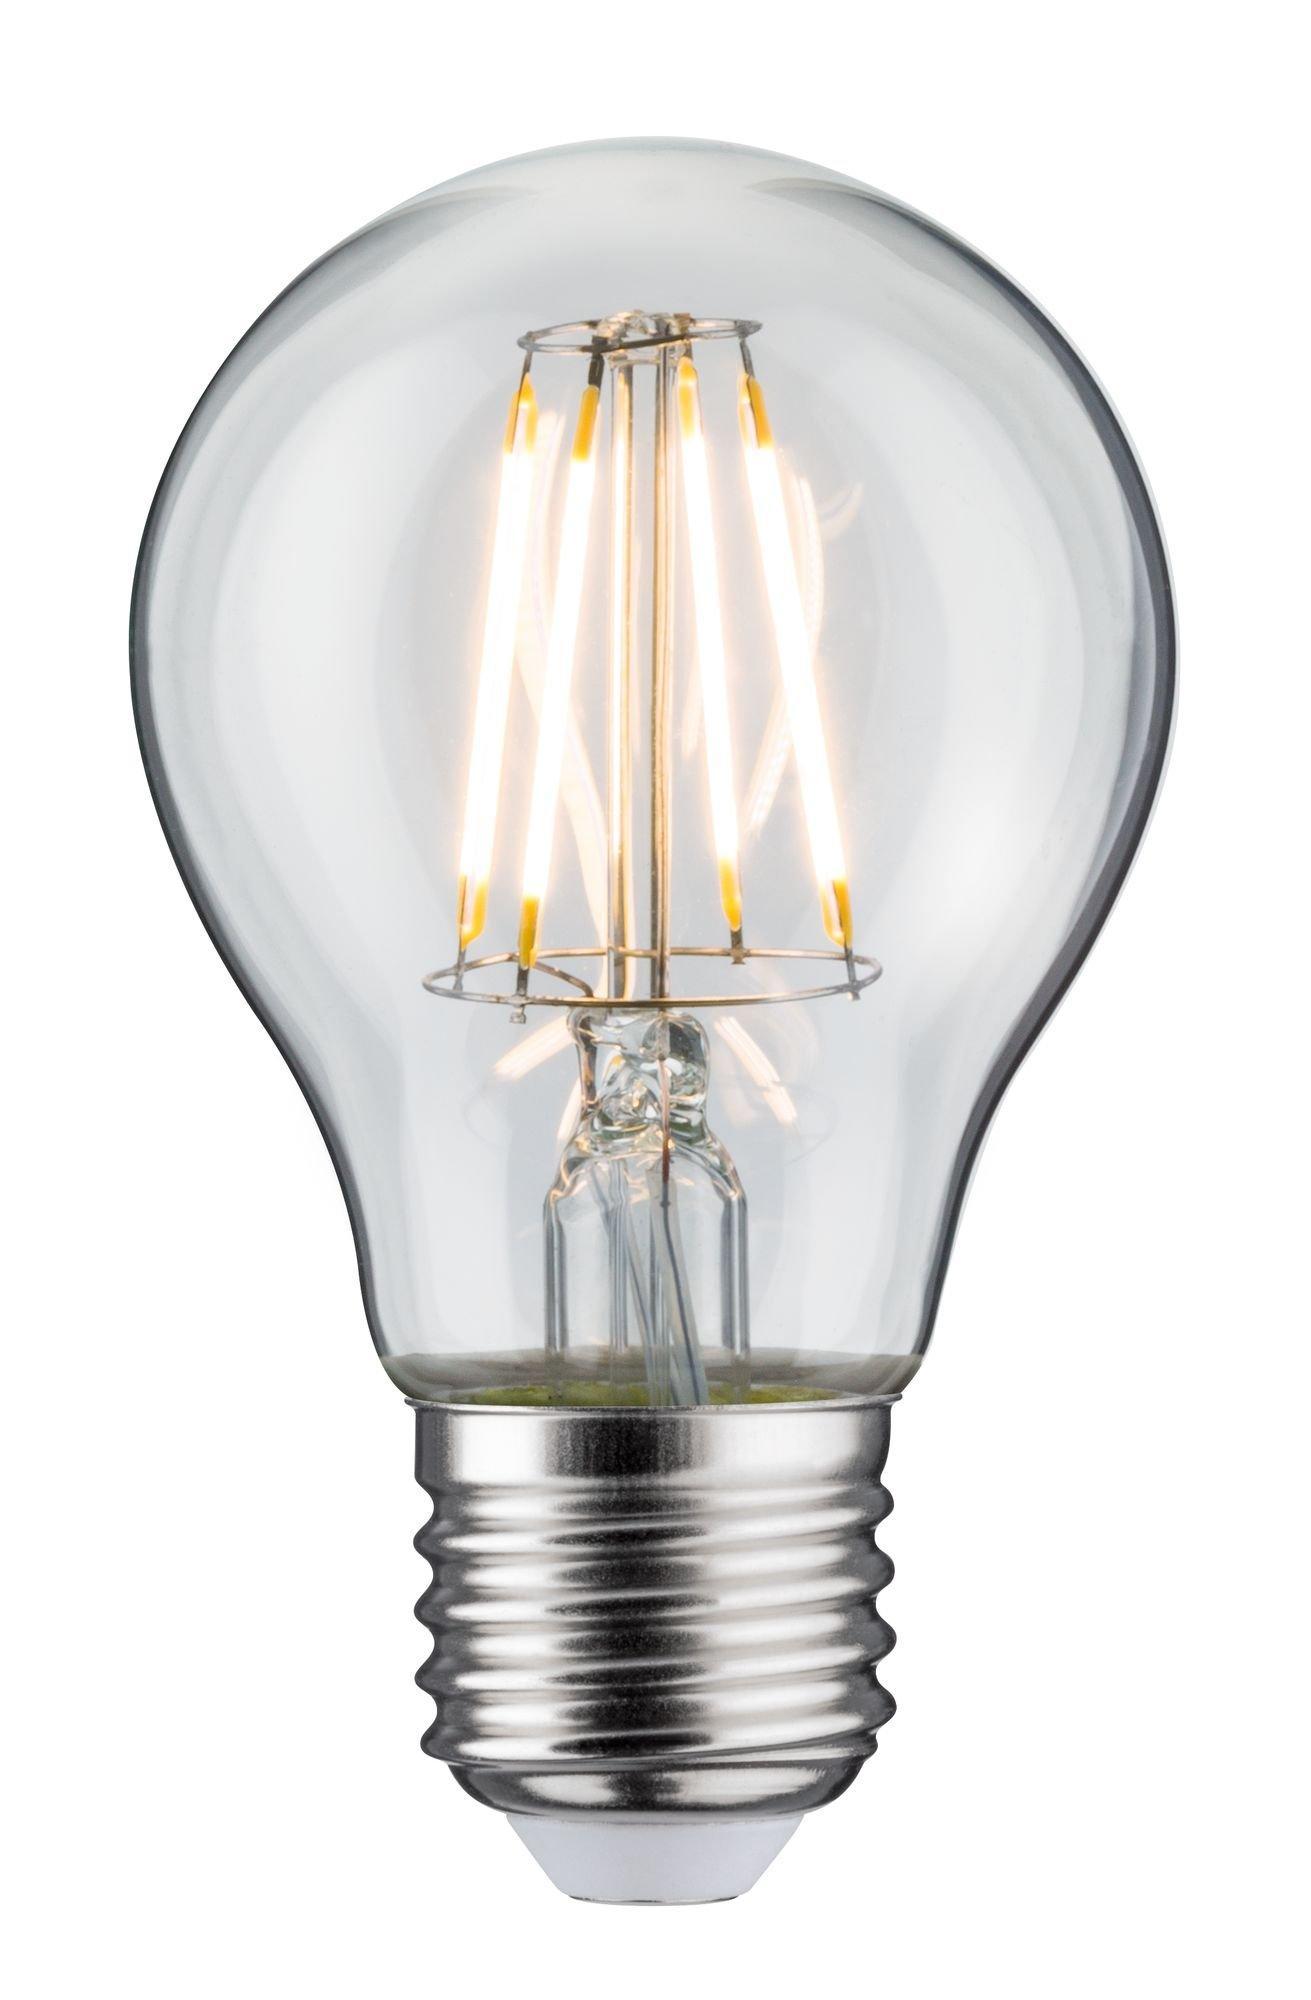 LED Birne Filament E27 230V 470lm 4,3W 2700K Klar